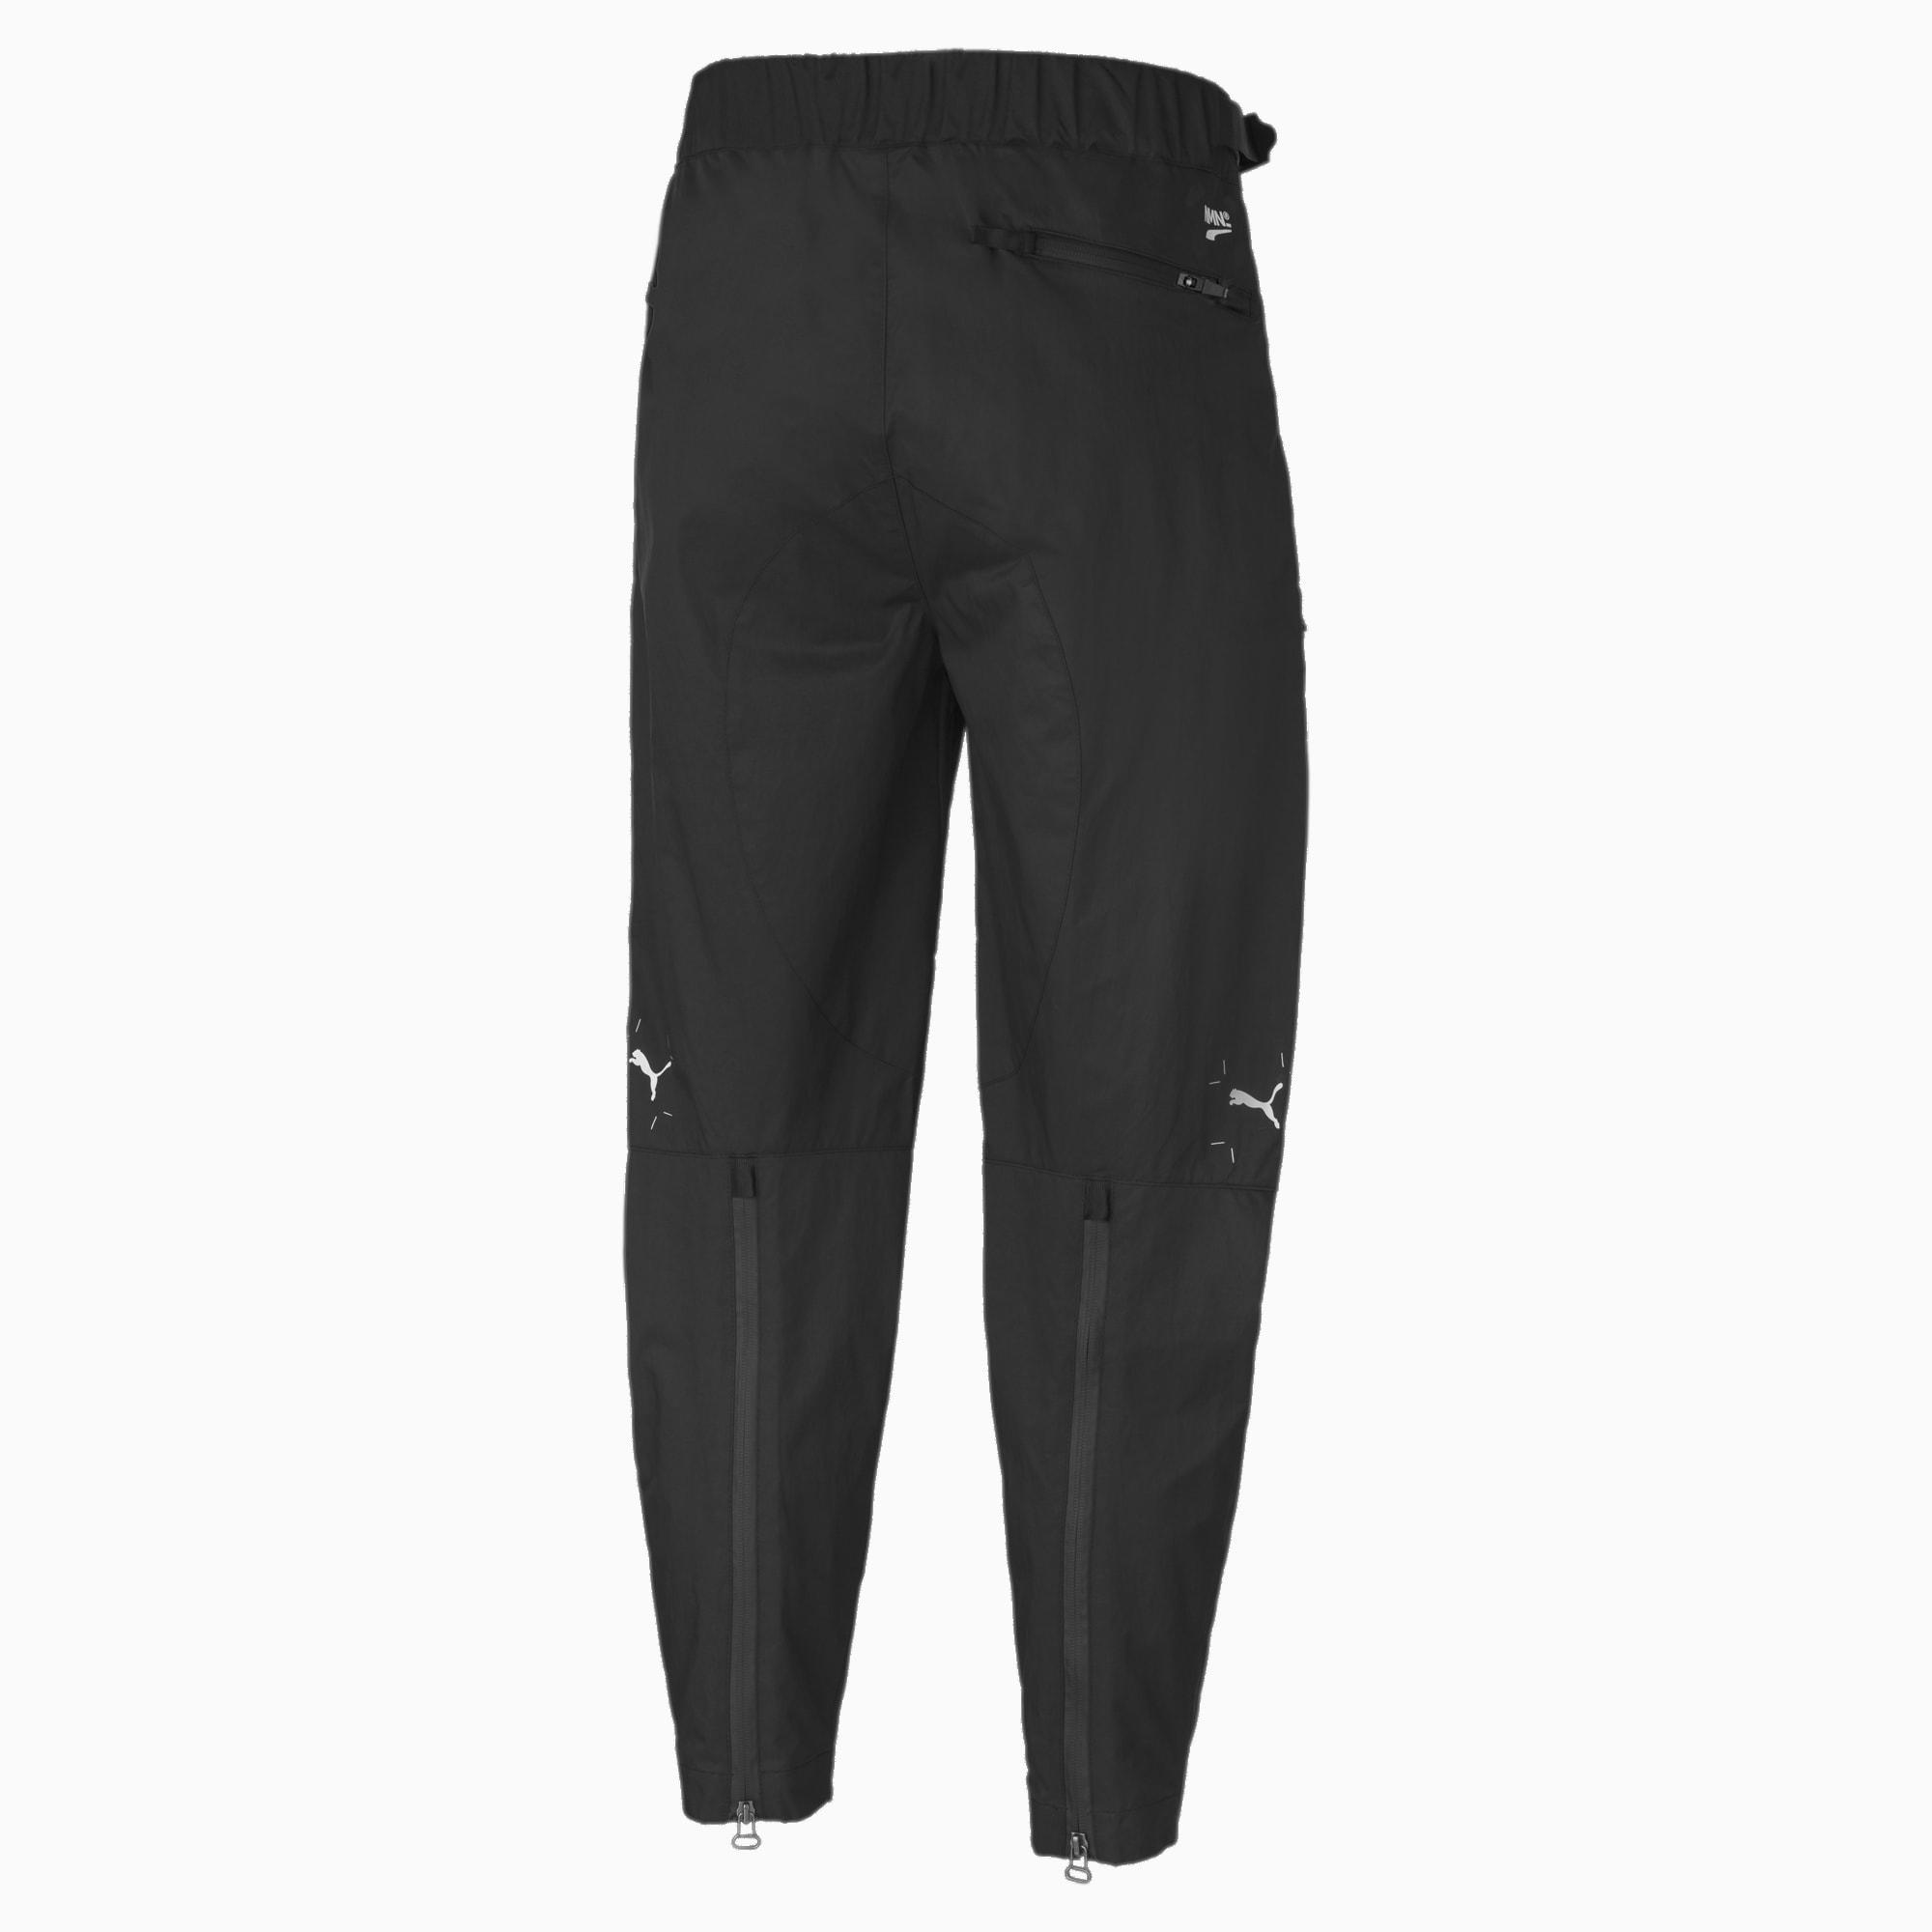 PUMA x NEMEN Pilot Men's Pants